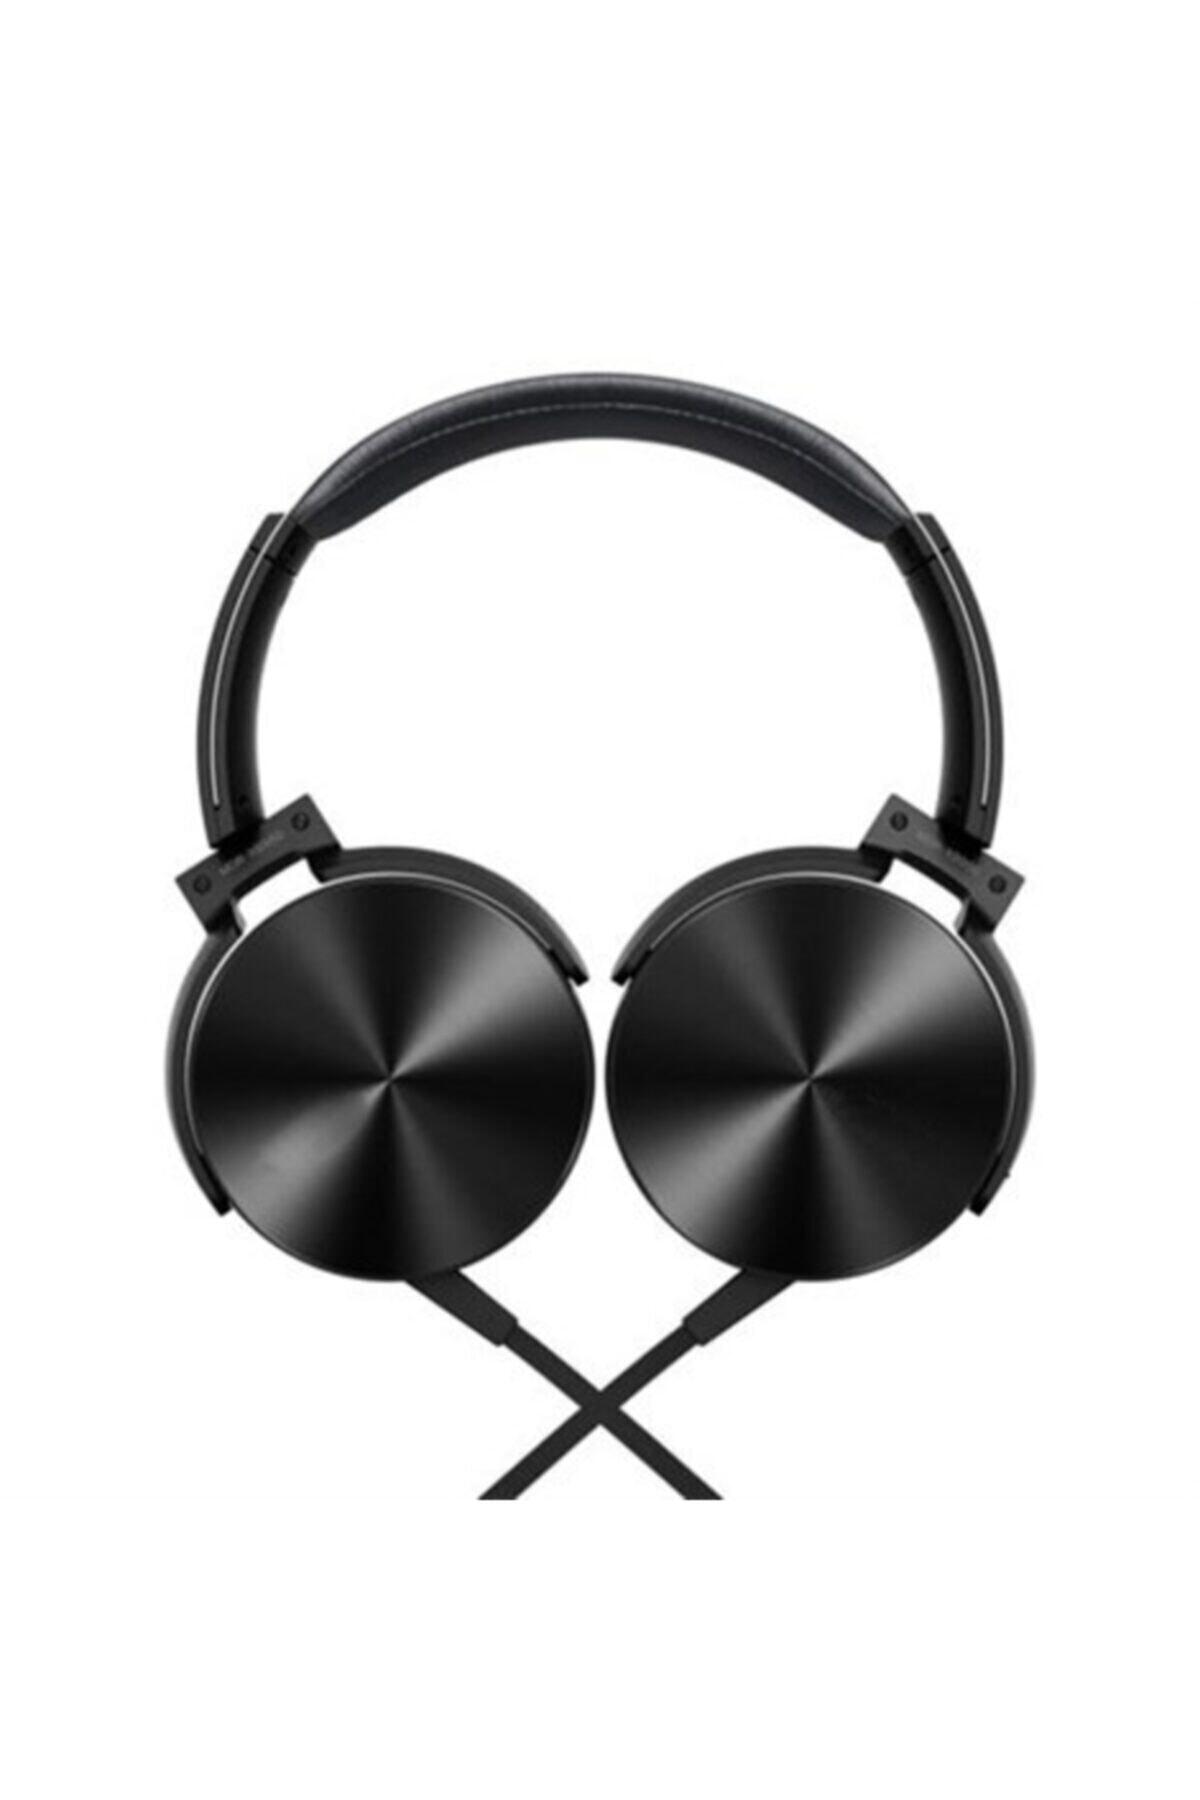 OKMORE Siyah Kafa Üstü Telefon Oyun Kulaklığı Extra Bass Stereo 2